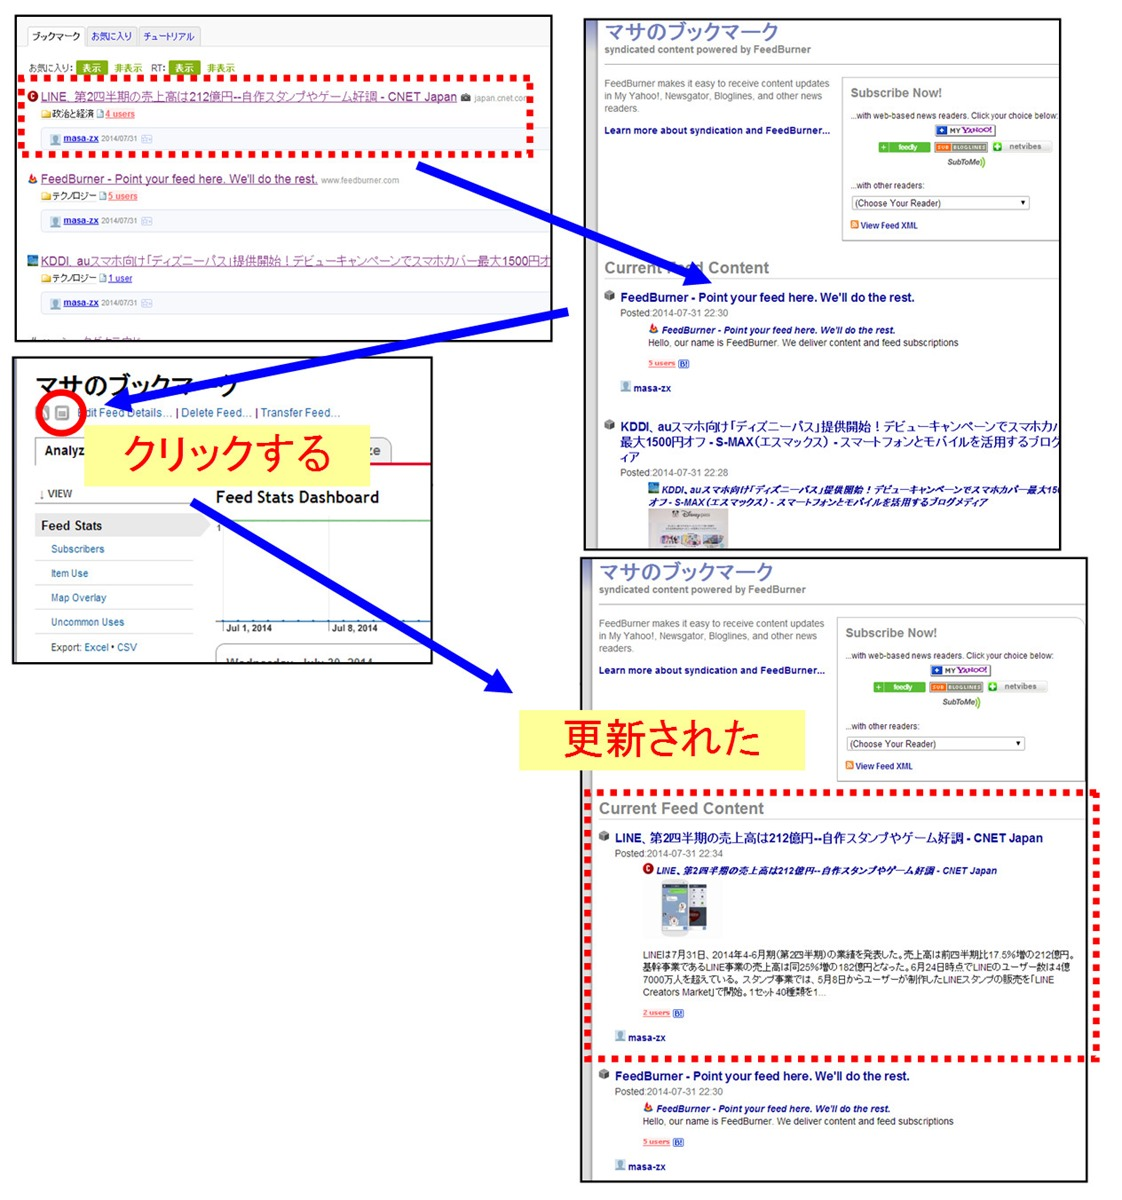 「FeedBurner」を手動で更新する方法